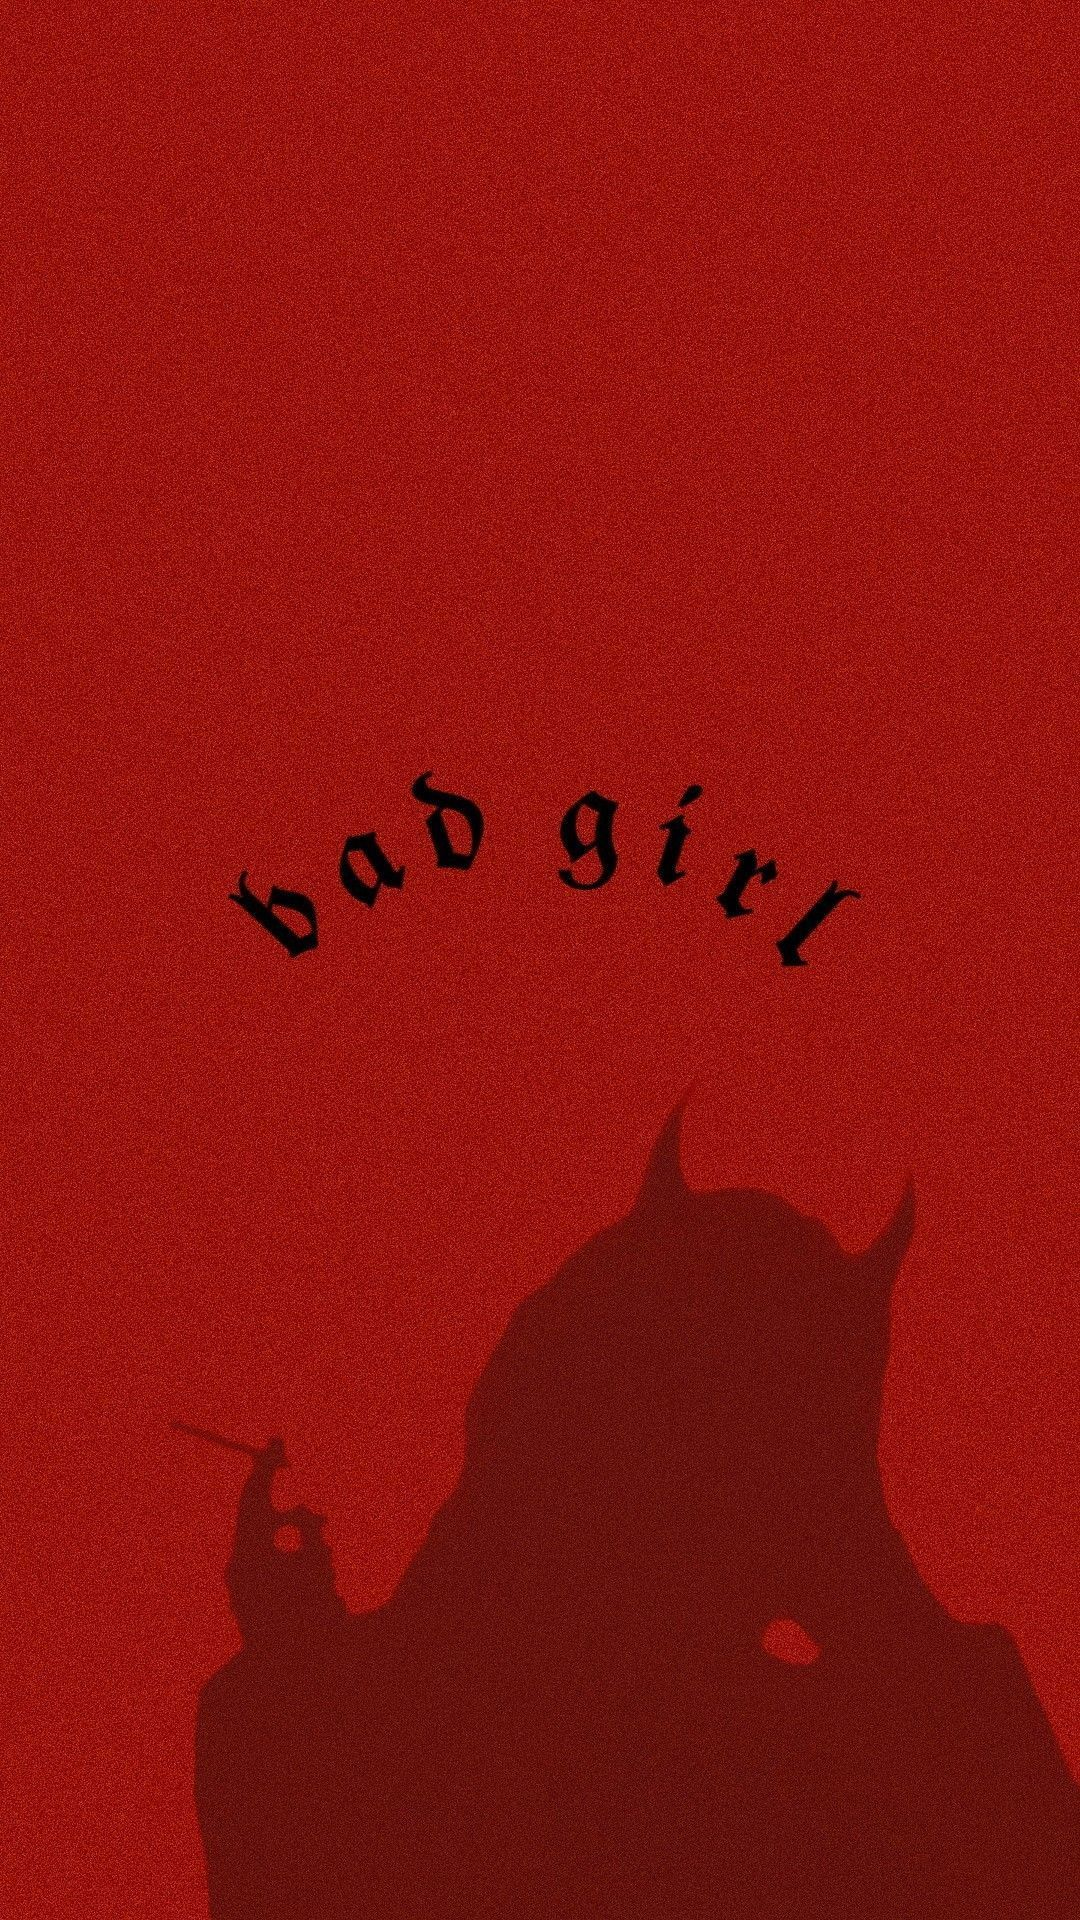 𝚋𝚊𝚍 𝚐𝚒𝚛𝚕 𝚠𝚊𝚕𝚕𝚙𝚊𝚙𝚎𝚛 In 2020 Bad Girl Wallpaper Badass Wallpaper Iphone Girl Wallpaper